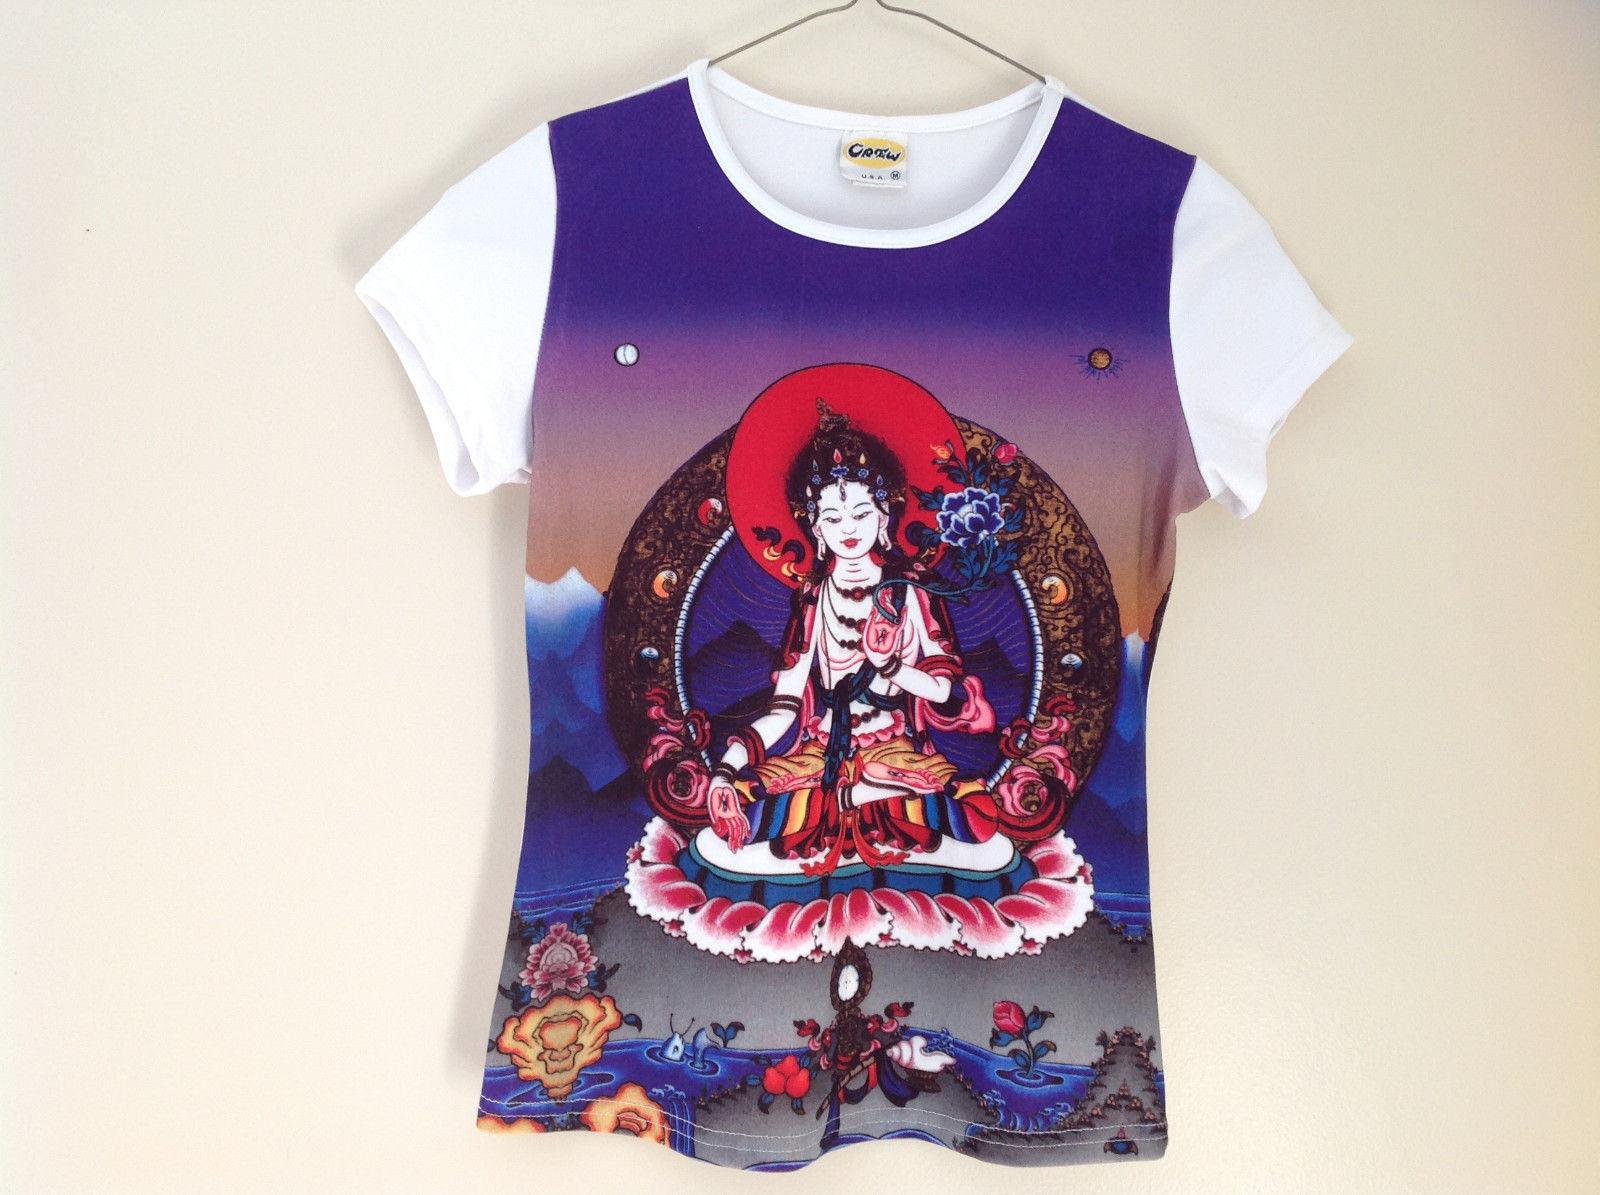 Indian Goddess Themed White Purple Short Sleeve Shirt Very Colorful Size Medium